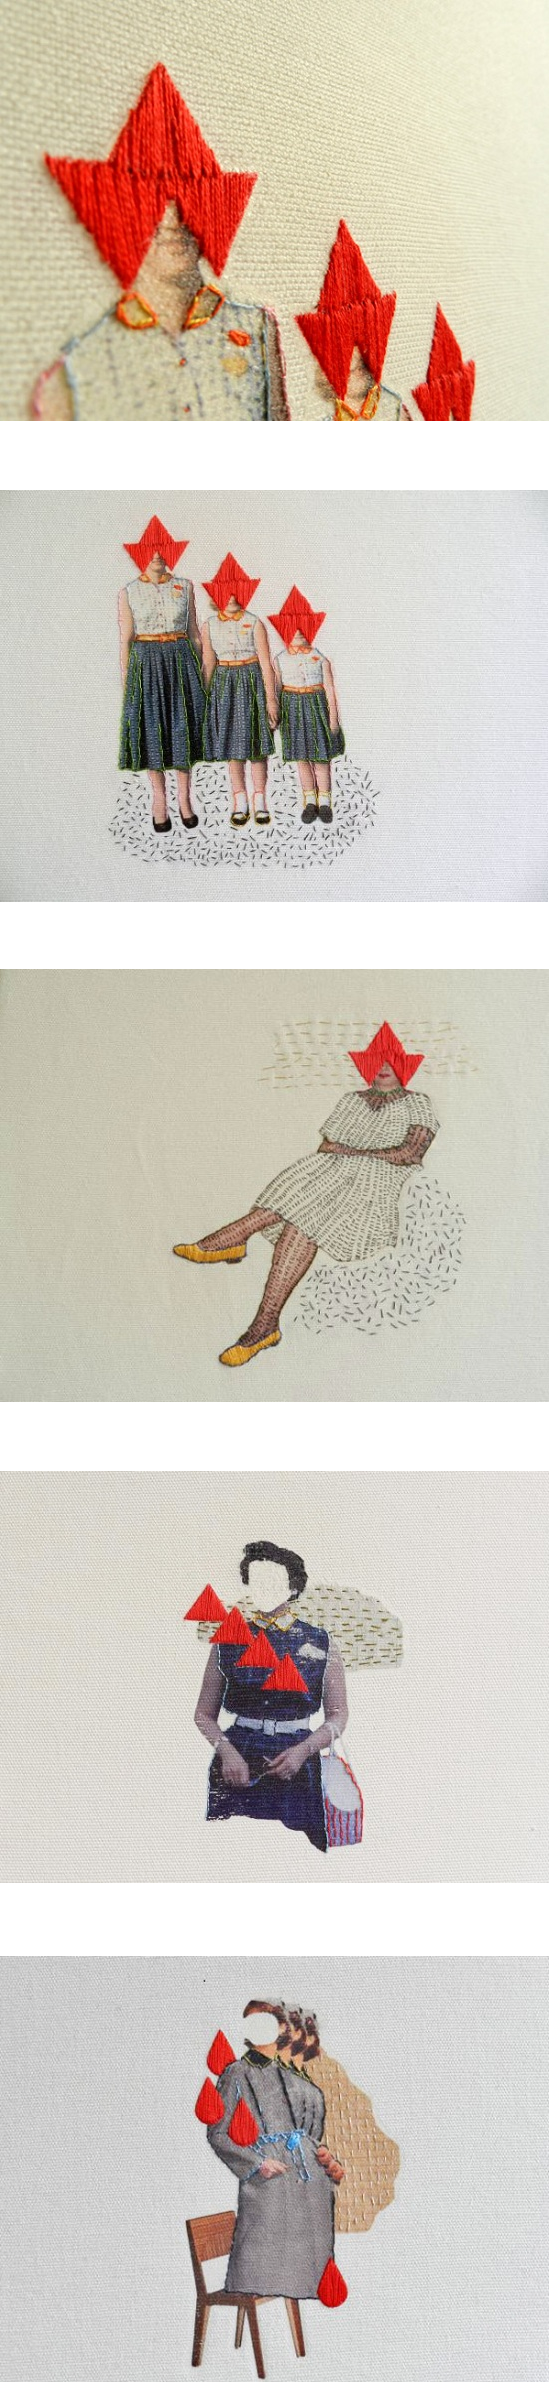 Textile Art by Hagar van Heummen of Happy Red Fish - THE ART CAKE